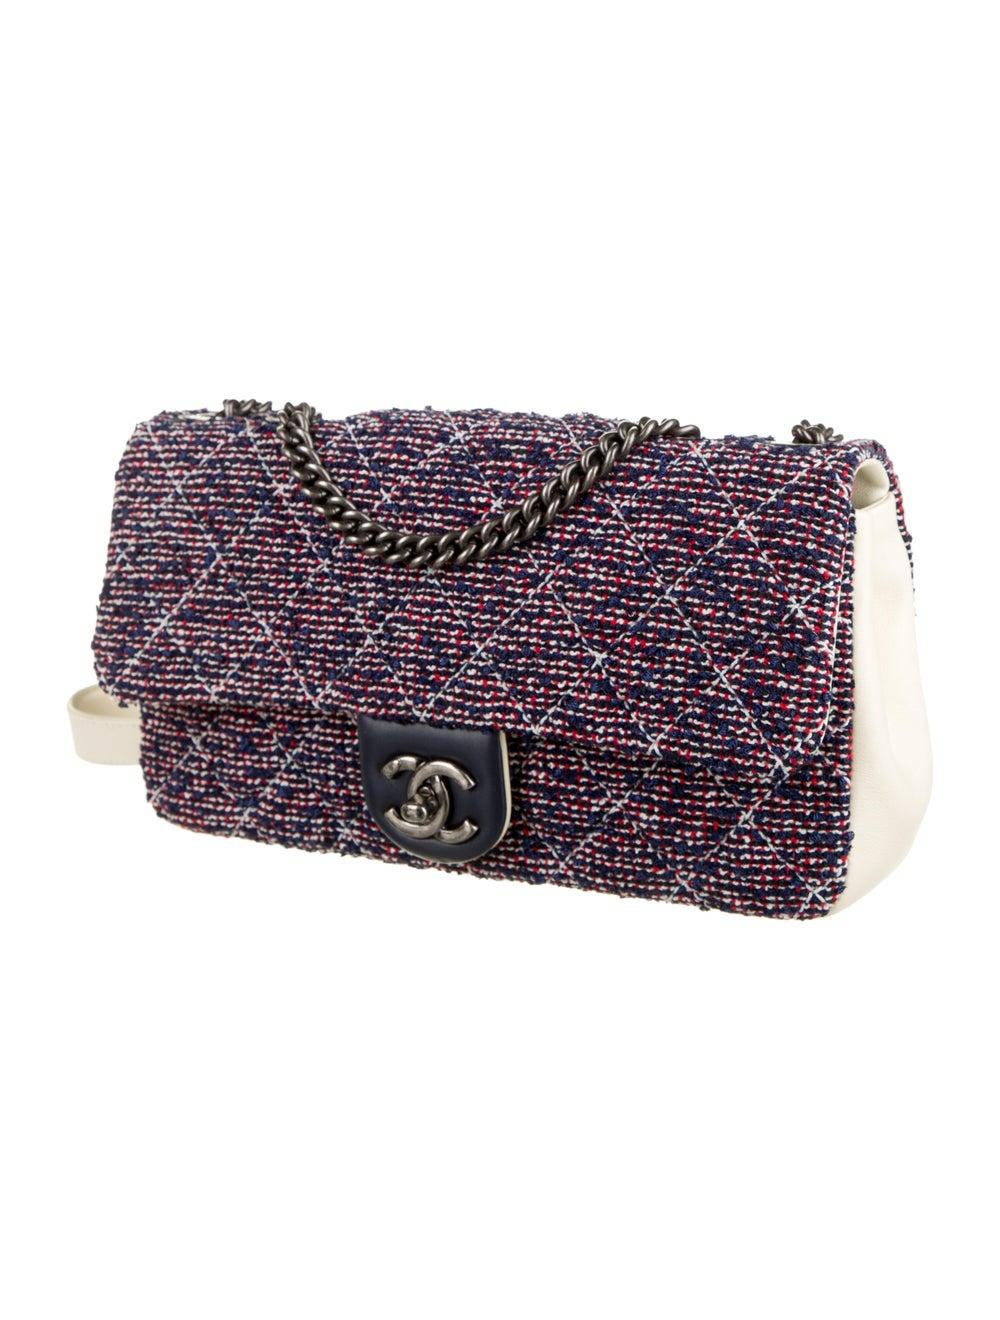 Chanel Airlines Tweed Crossbody Bag Navy - image 3